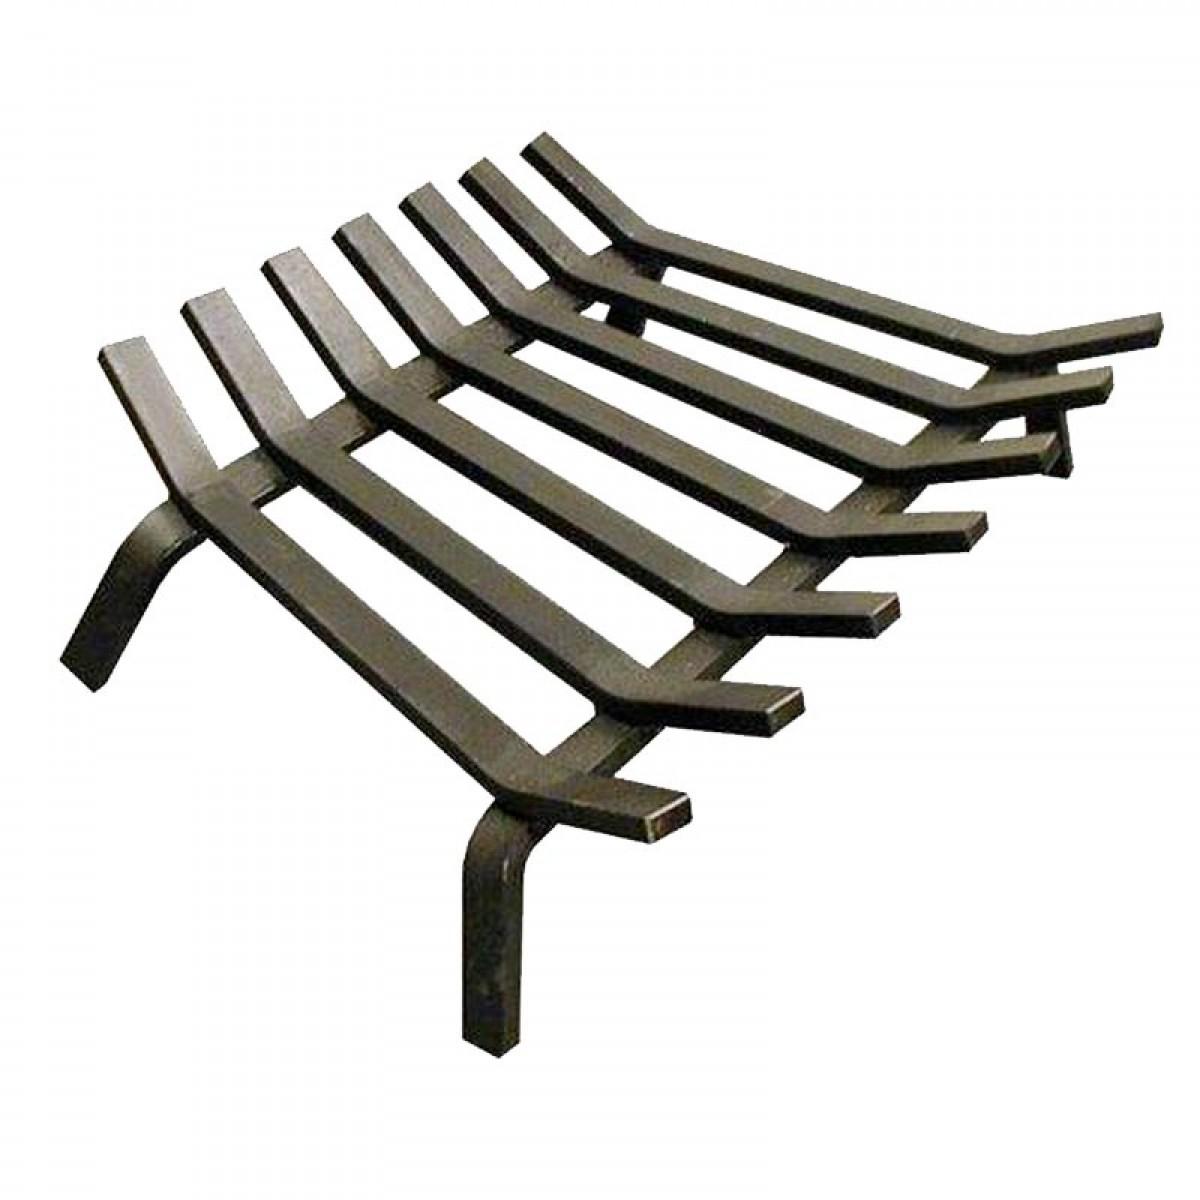 malm m18 fireplace iron grate for lancer 30 u0026 34 zircon u0026 fire drums